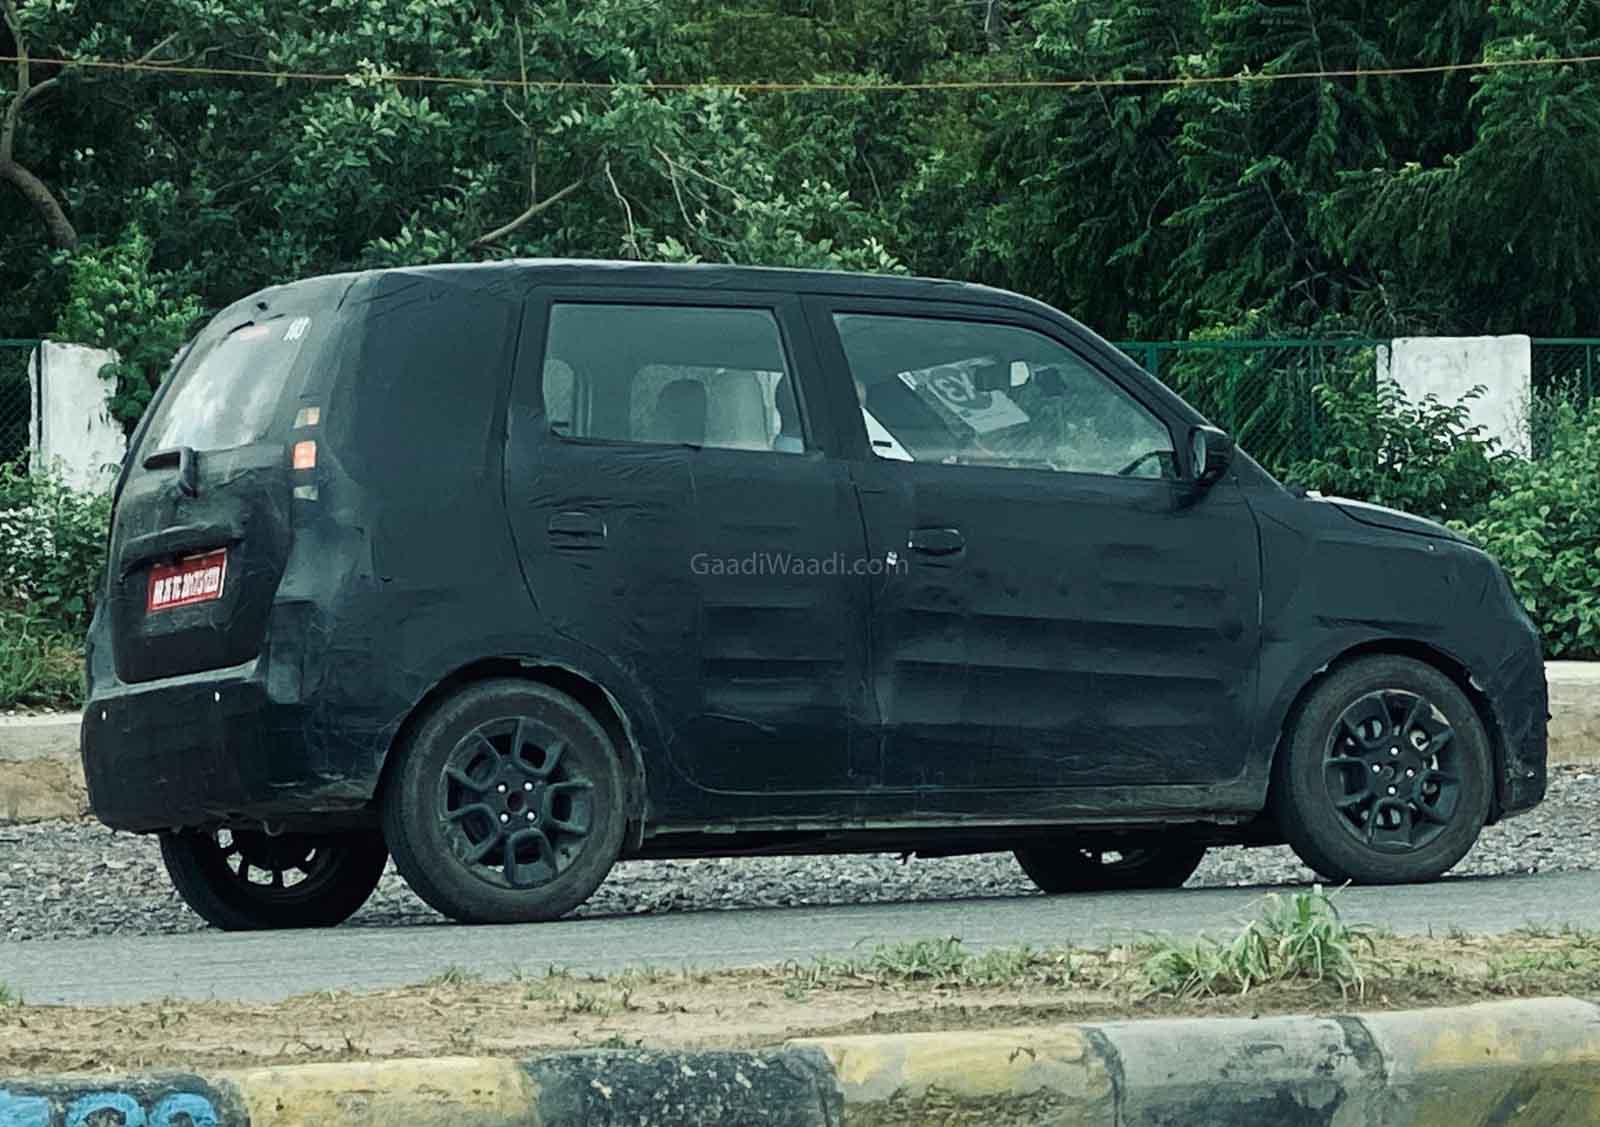 2021 Maruti Suzuki Wagon R EV Spied Again Showing Side Profile